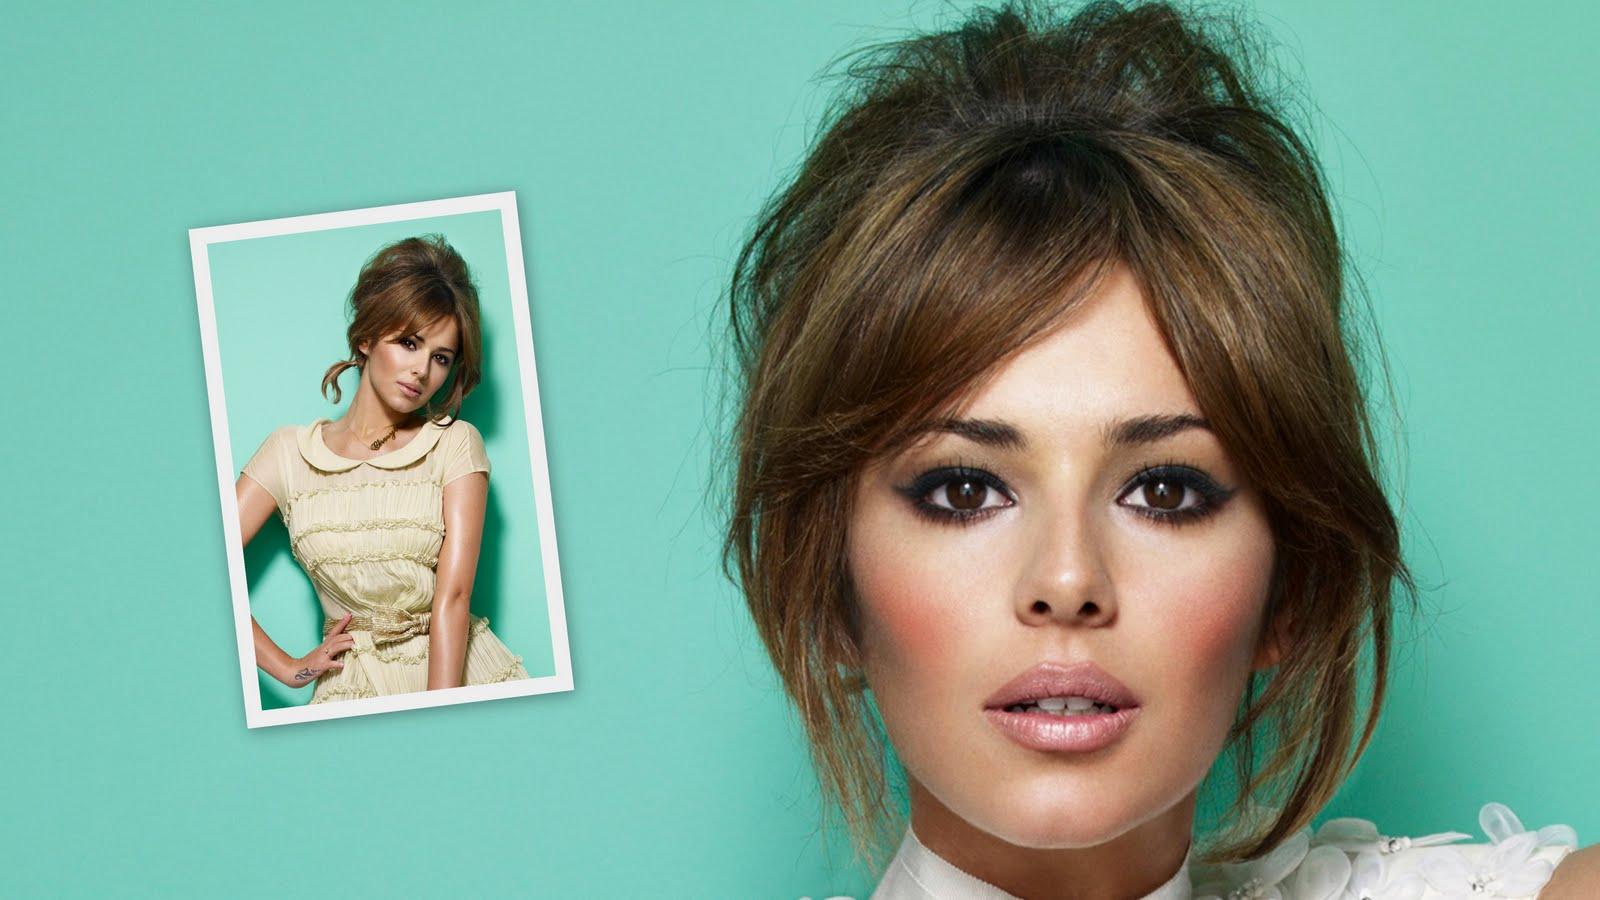 http://2.bp.blogspot.com/-9pJMw7h9teg/Tw4HQaZqKQI/AAAAAAAAAIc/bdzK7D4PaQU/s1600/Cheryl+Cute+Hair.jpg